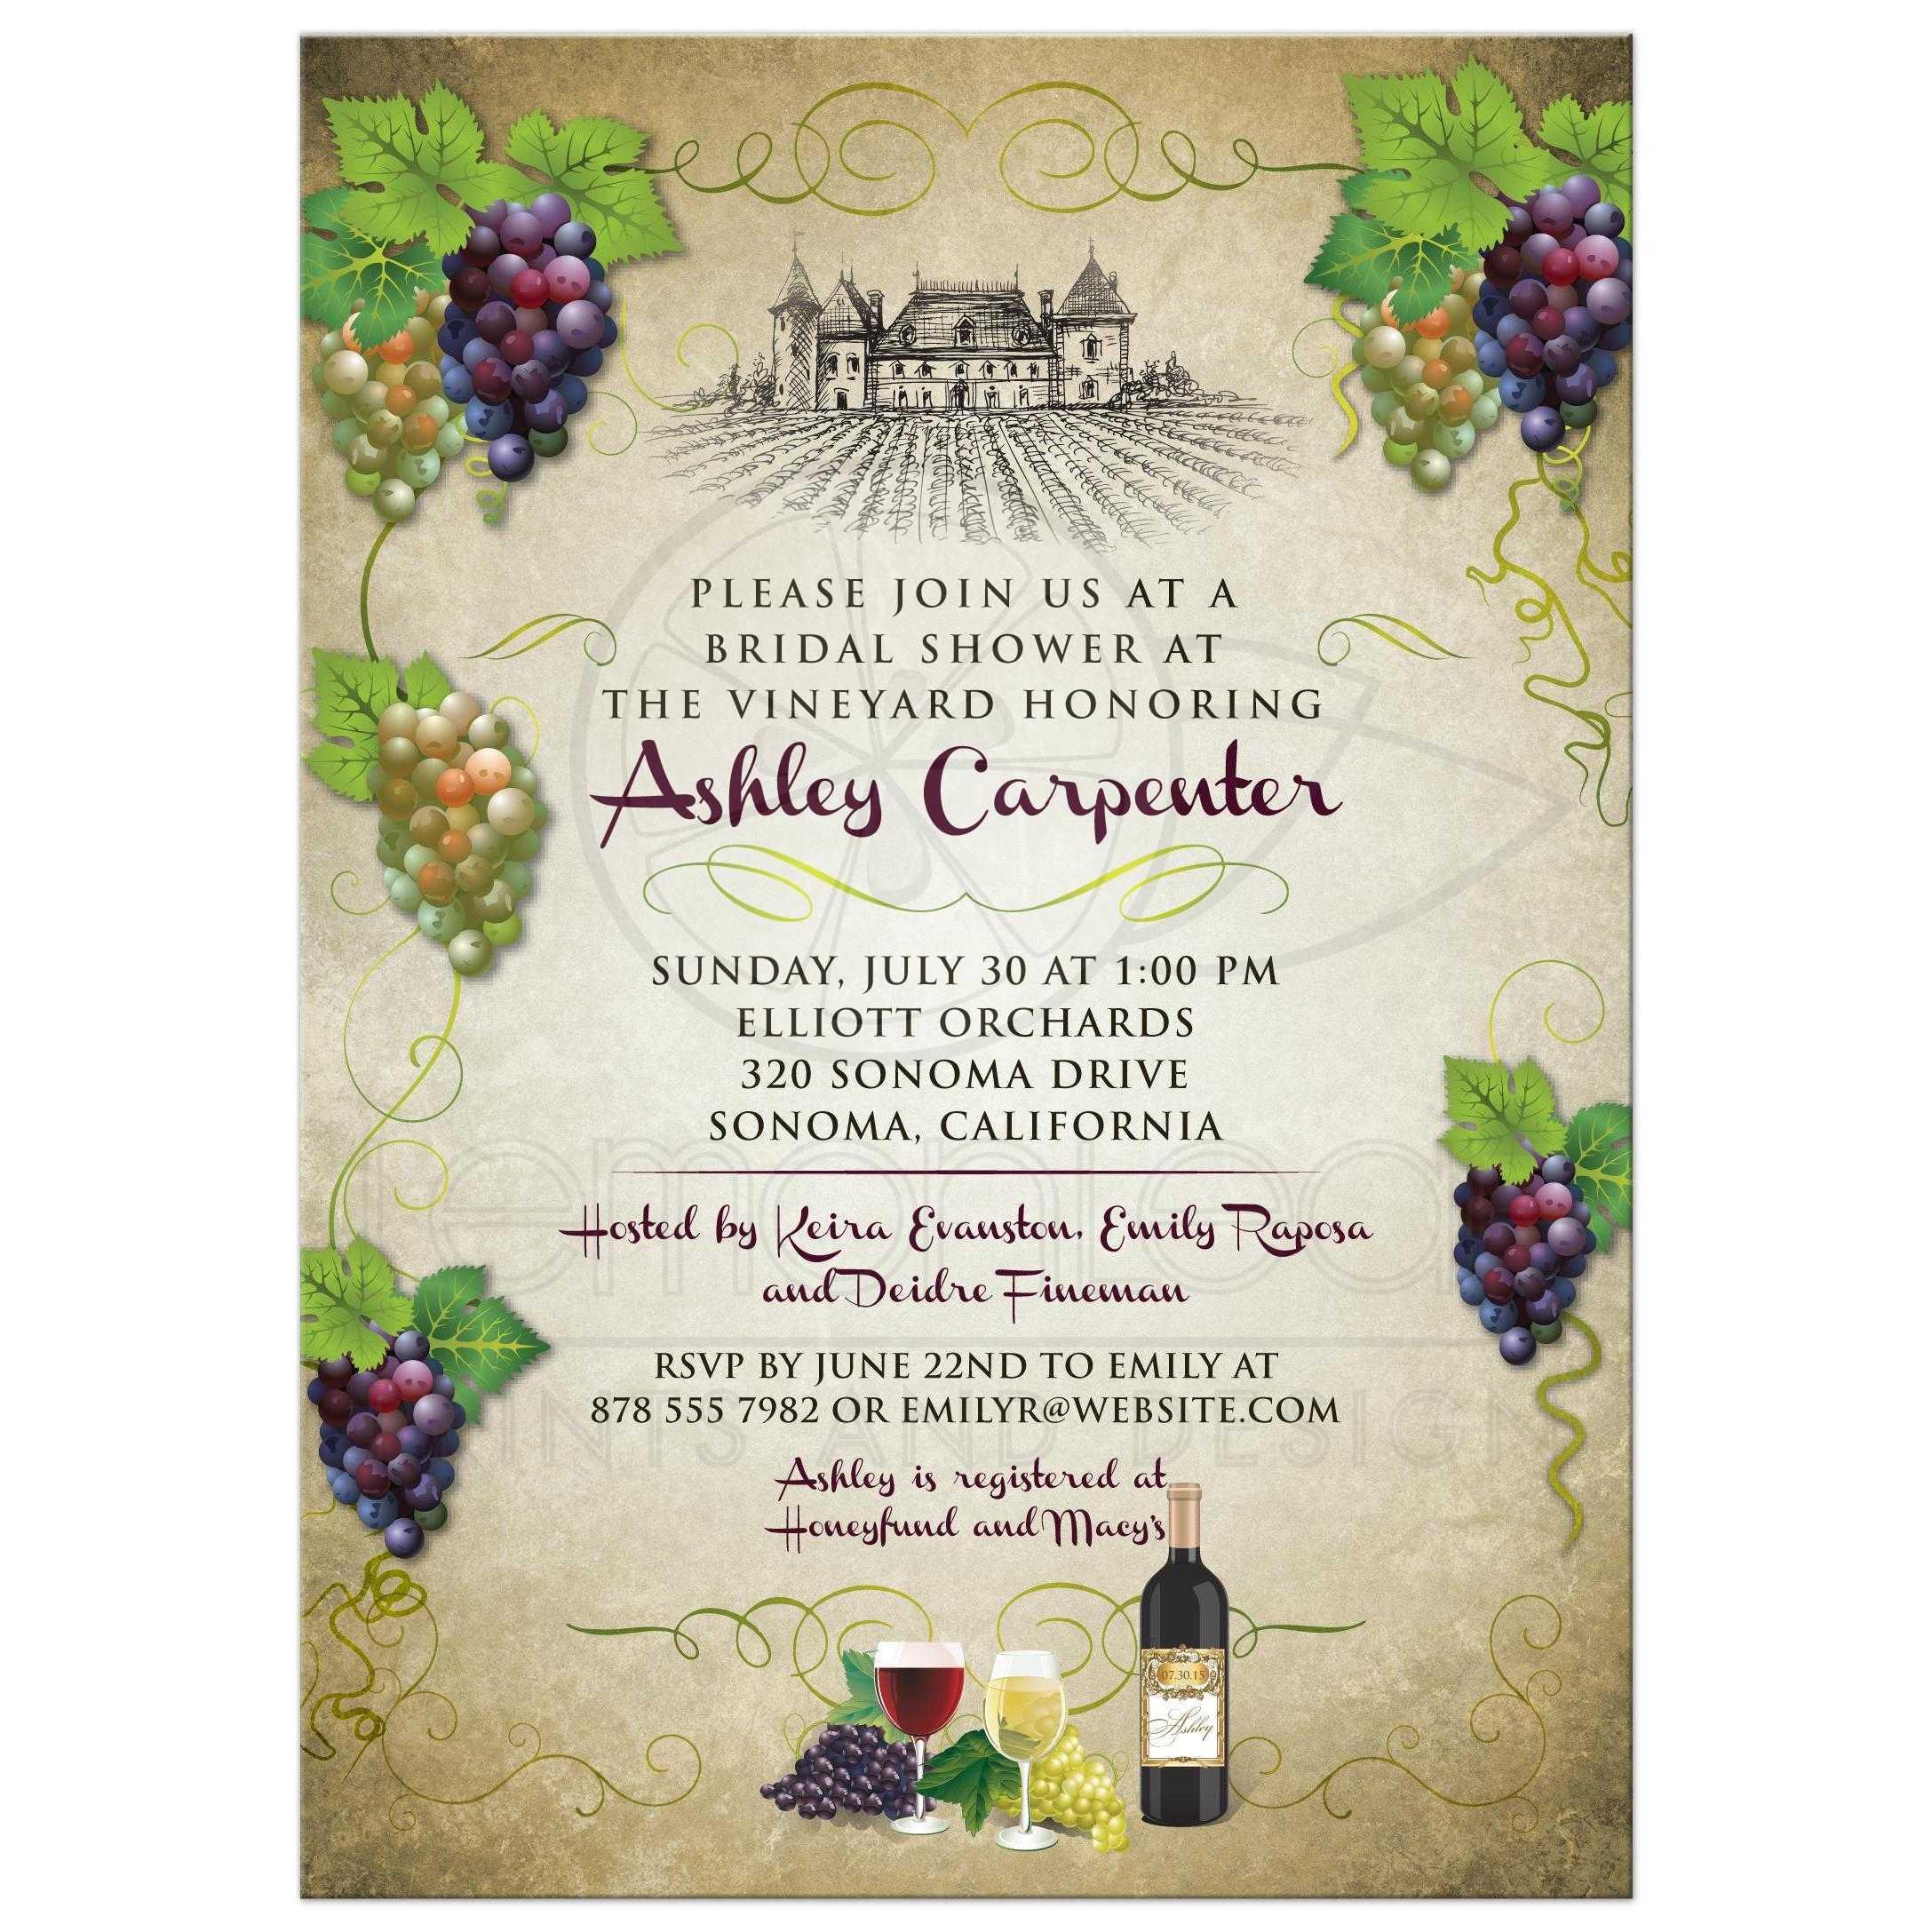 Bridal Wedding Shower invitation - Vineyard Wine and Grapes